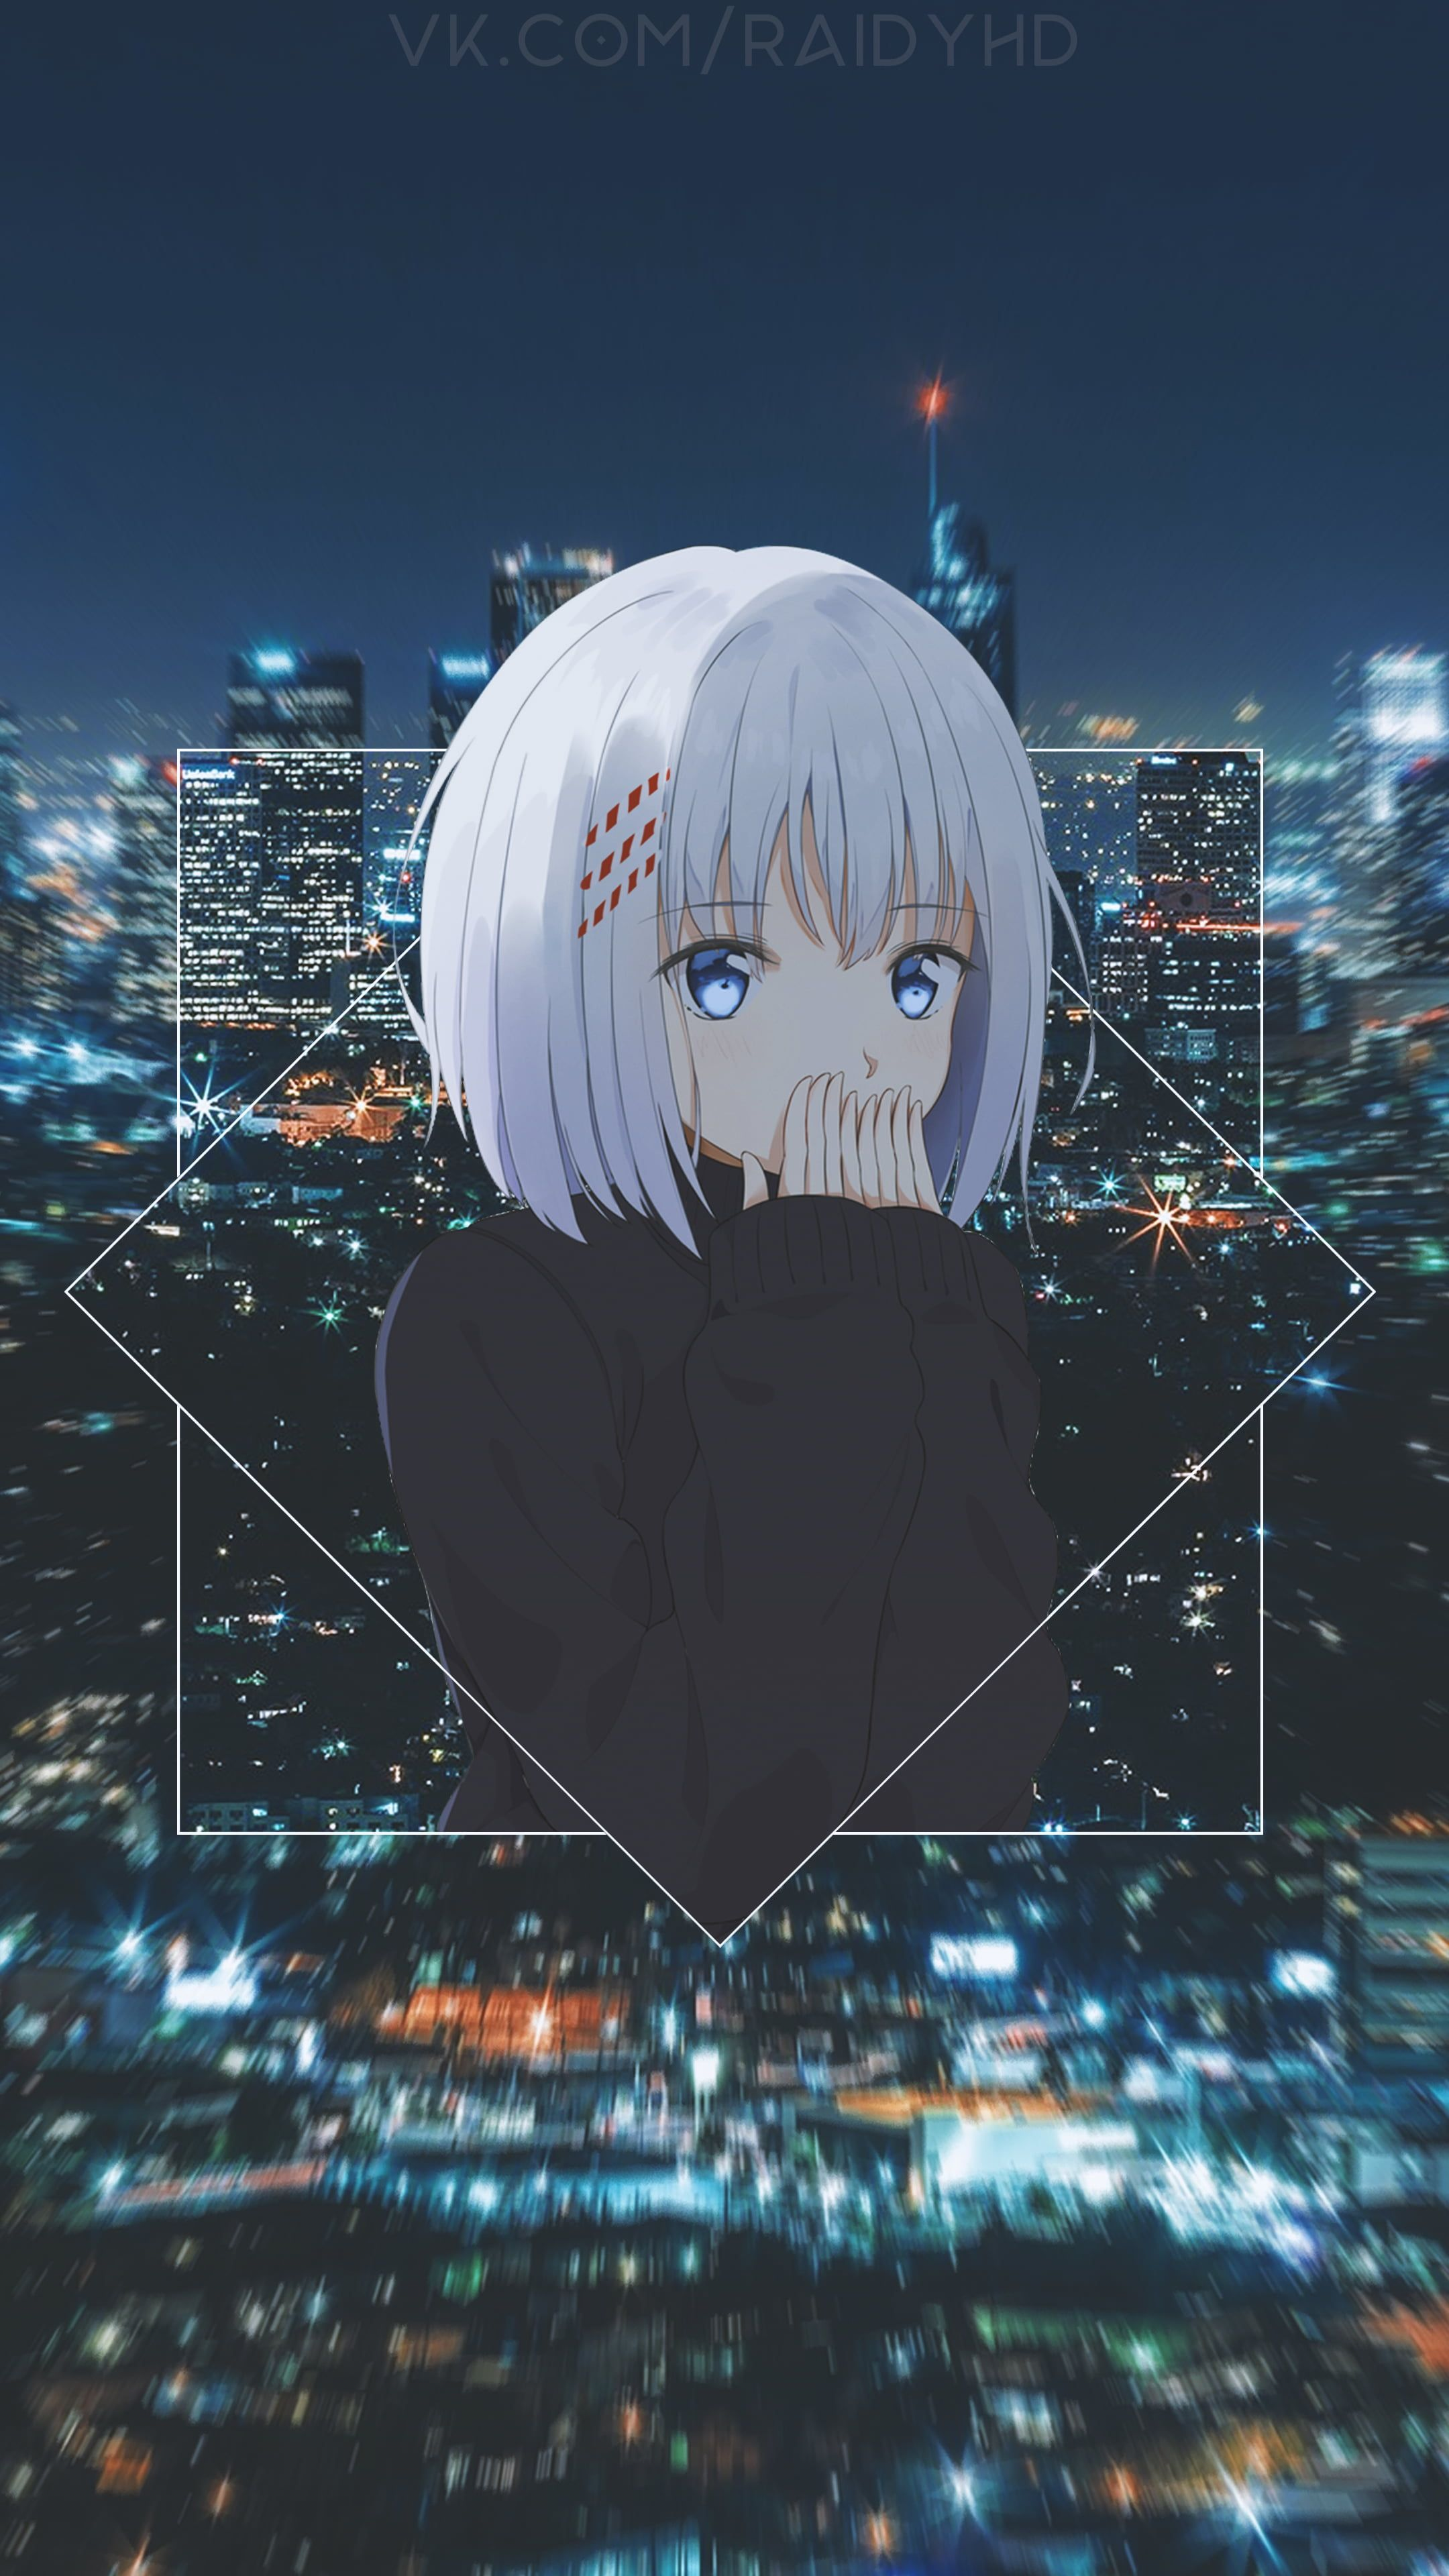 Tobiichi Origami Anime Girls Anime Picture In Picture 4k Wallpaper Hdwallpaper Desktop Anime Scenery Wallpaper Cool Anime Pictures Hd Anime Wallpapers